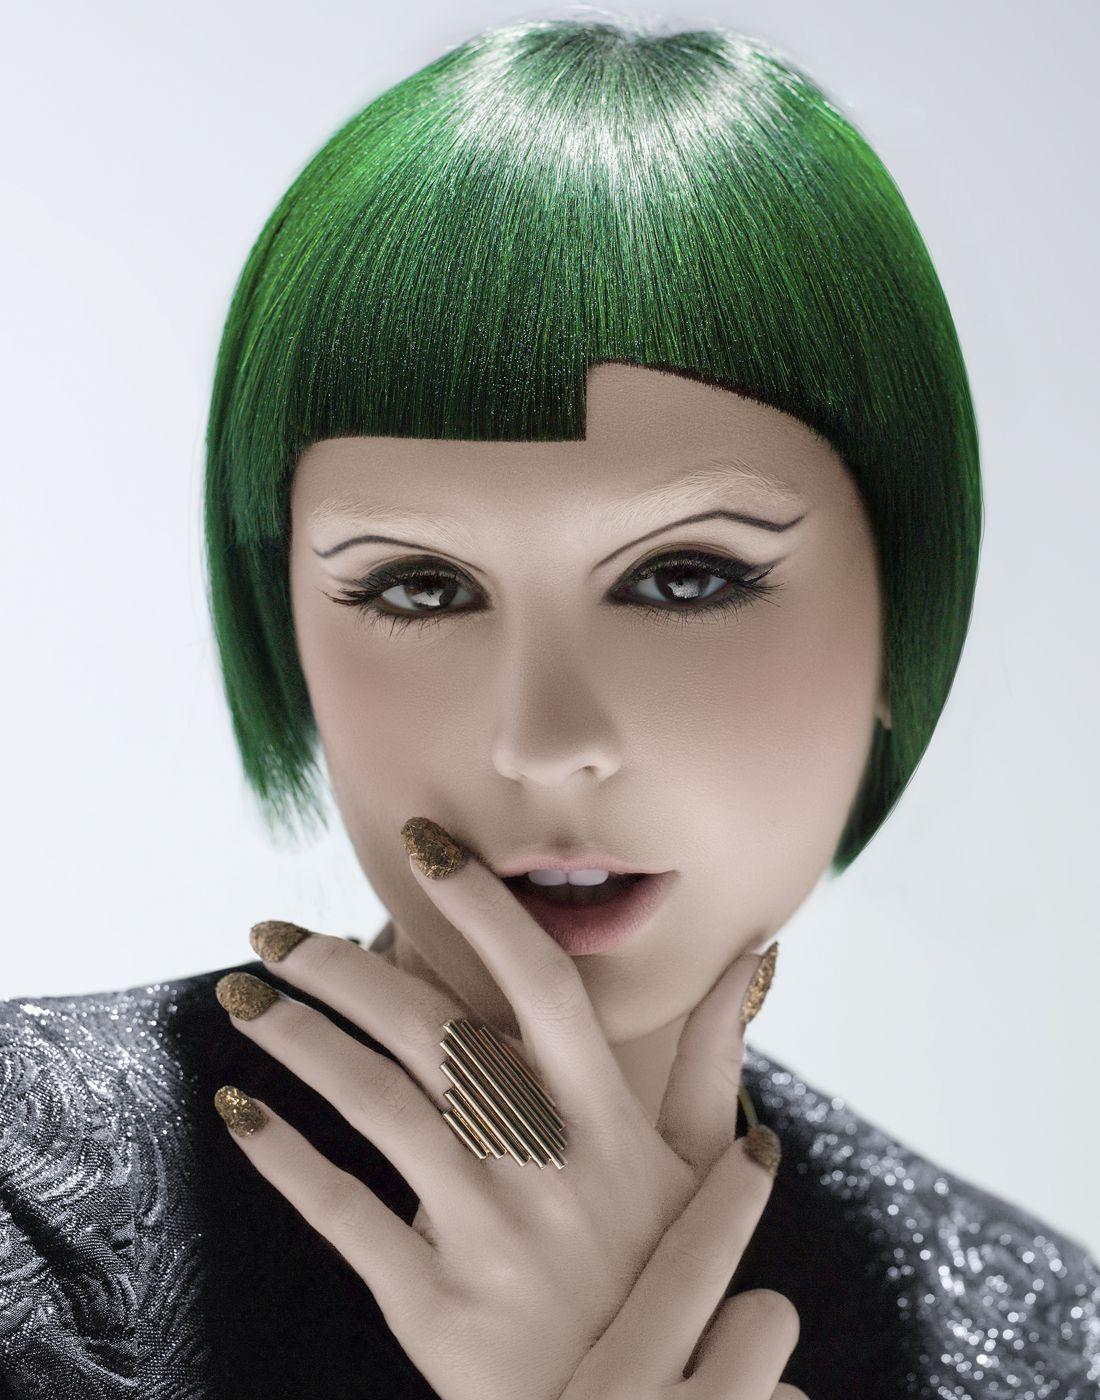 Virtuosity hairconceptphotography damien carney damiencarney